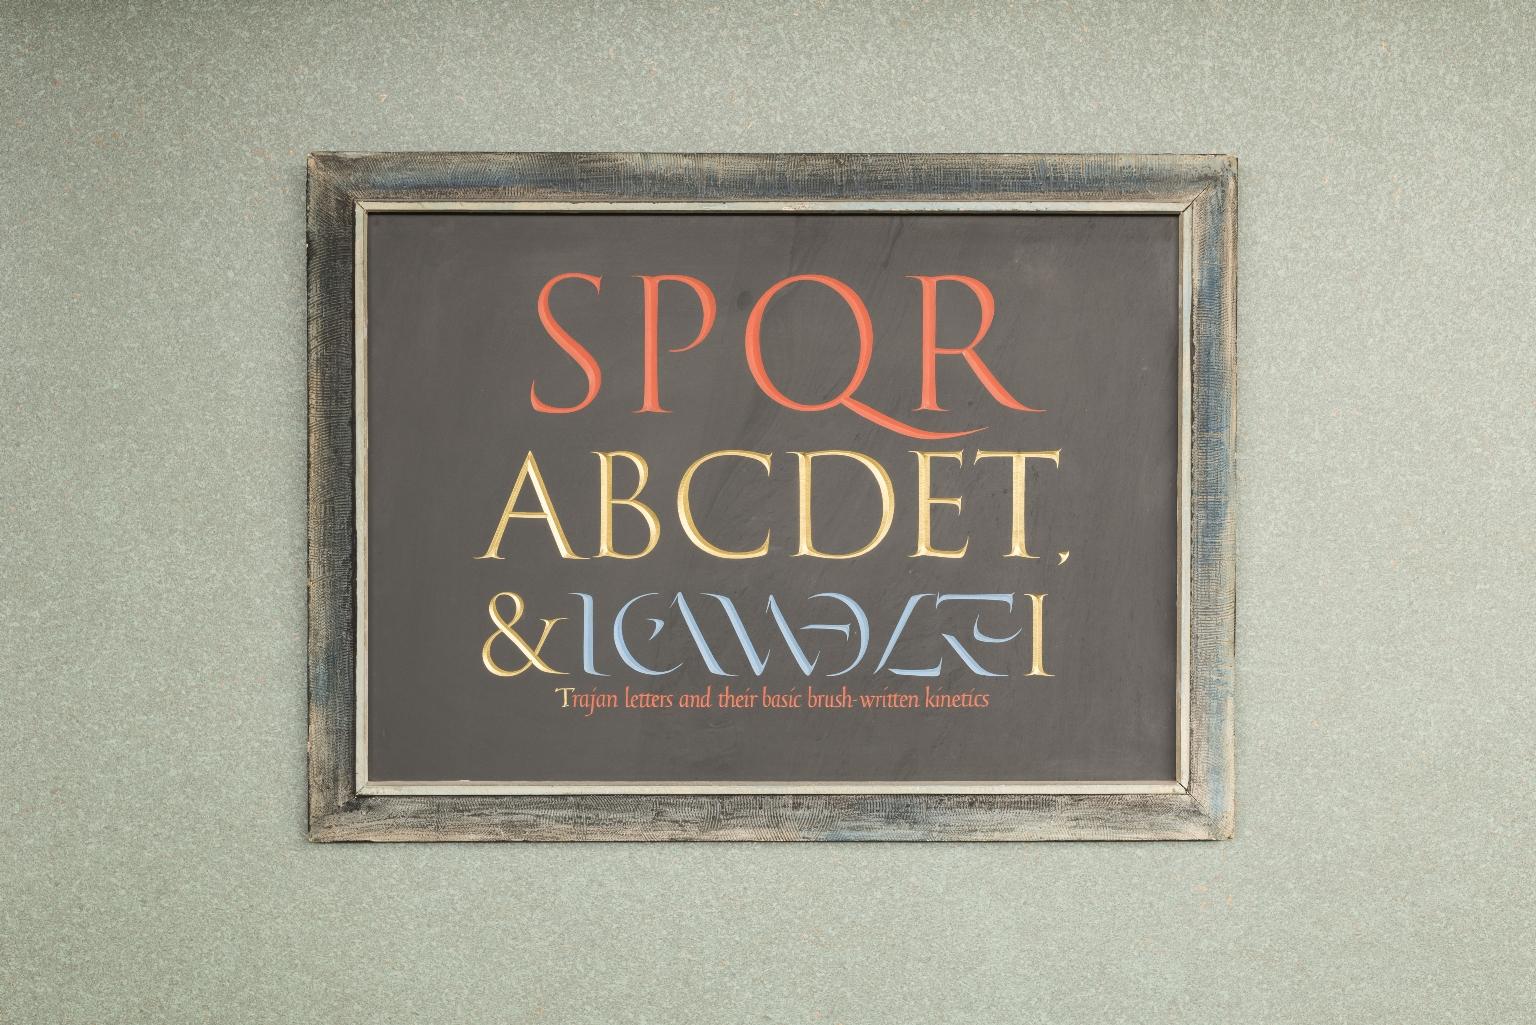 Trajan letters and their basic brush written kinetics